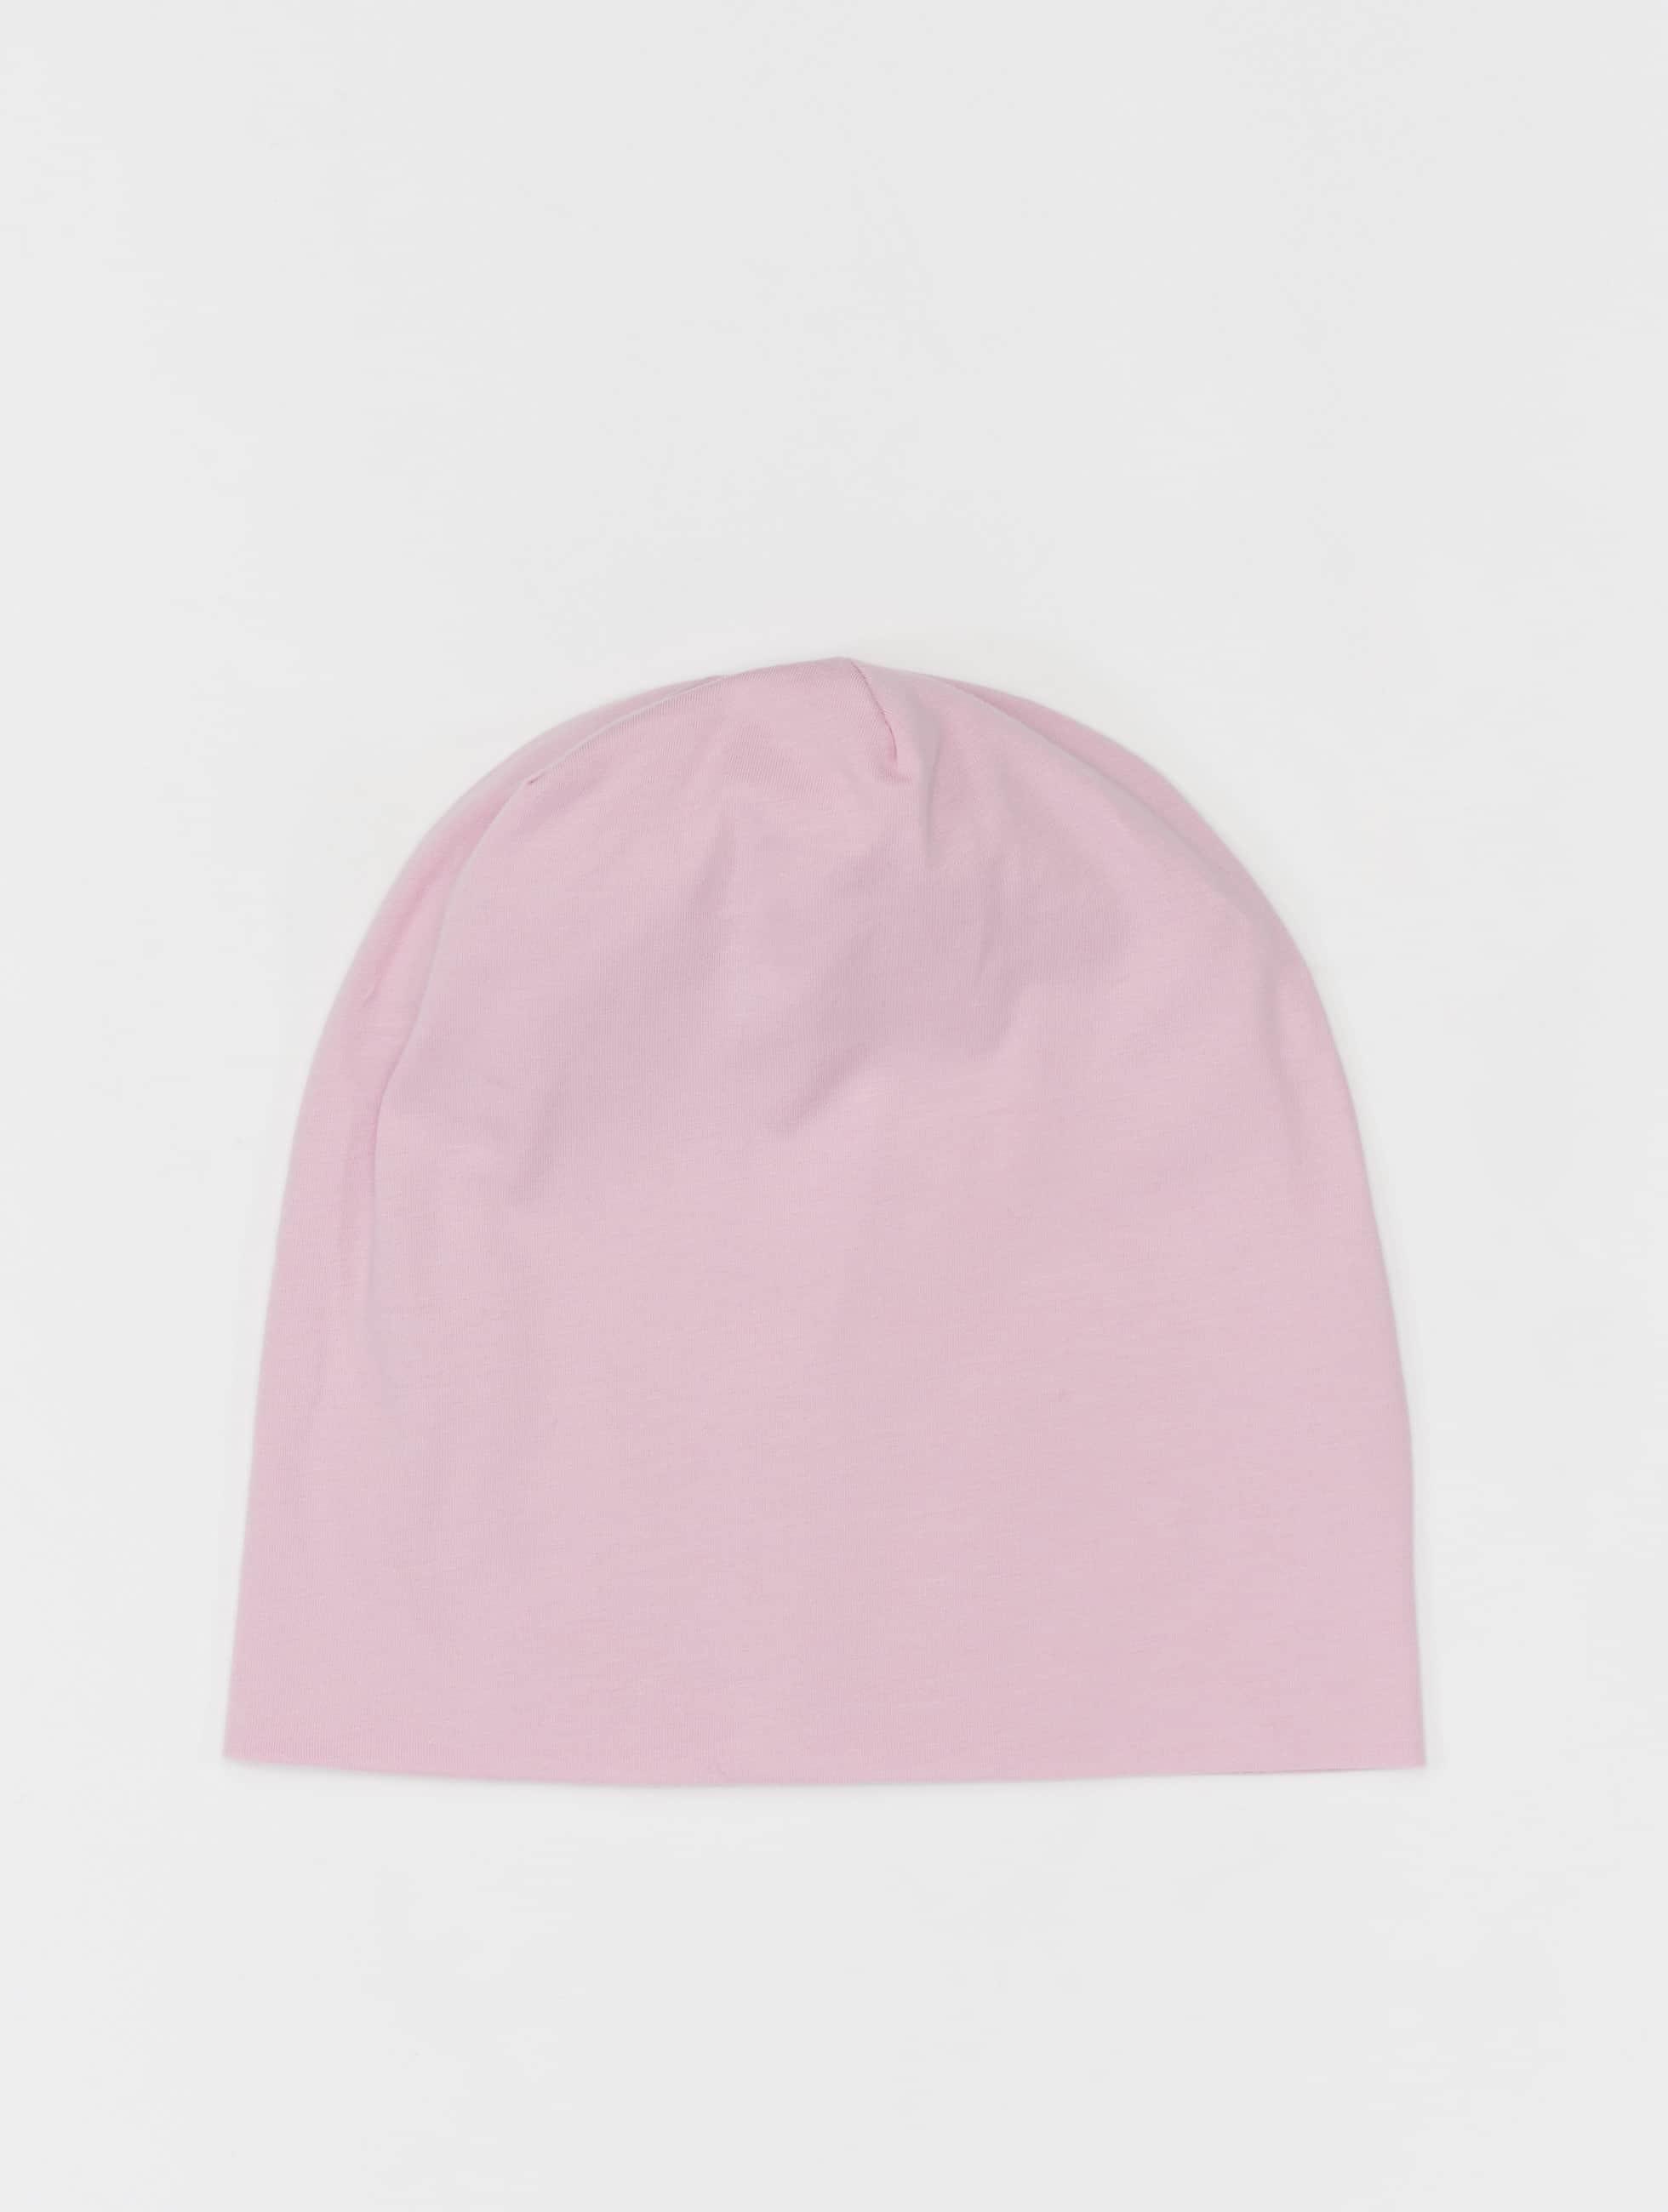 MSTRDS шляпа Pastel Jersey розовый